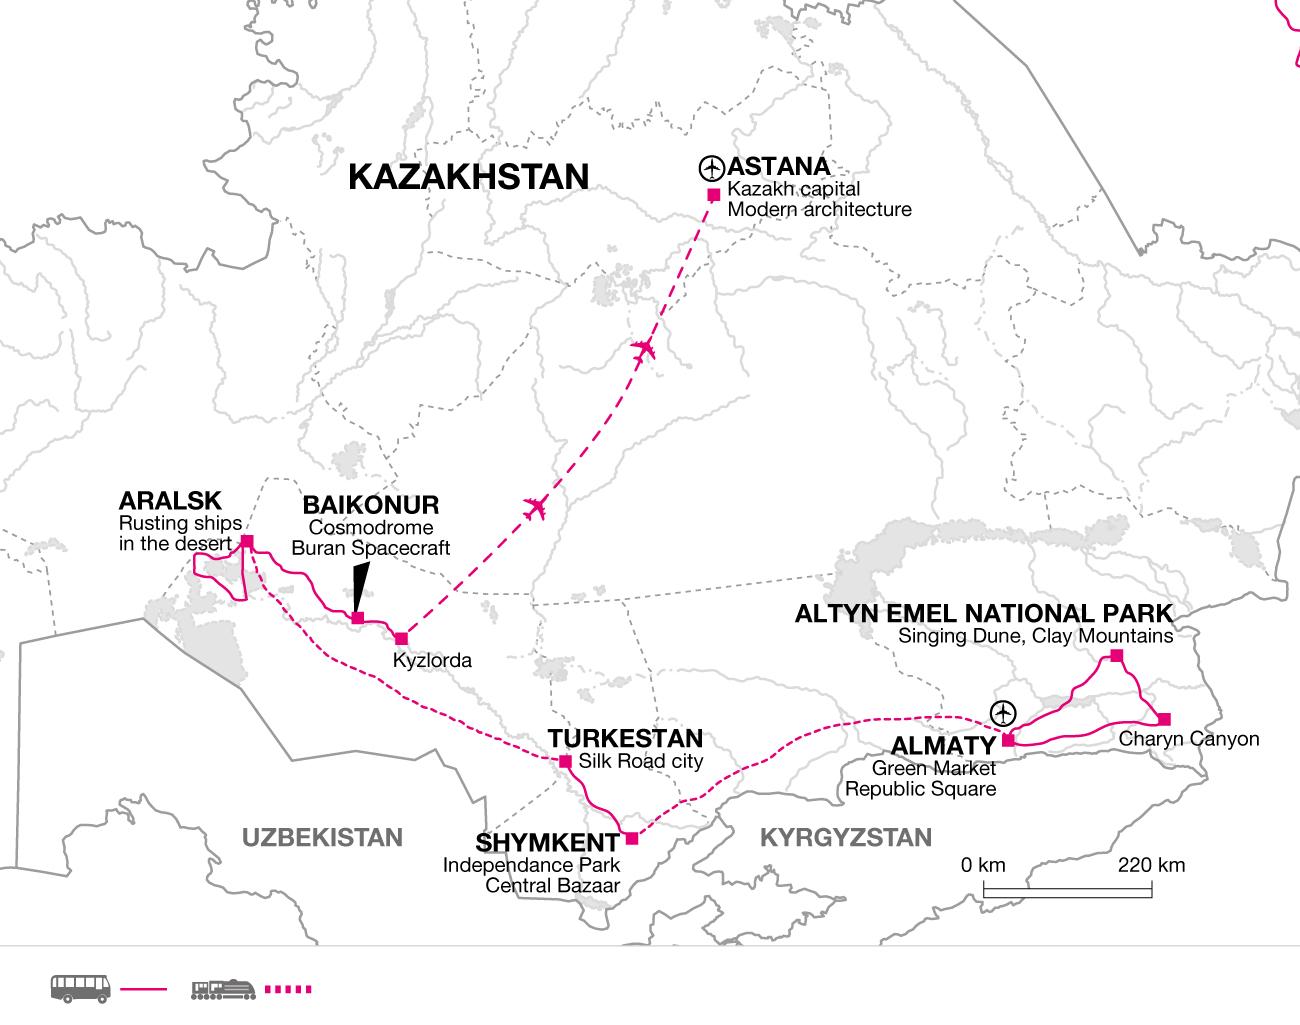 2018 itinerary